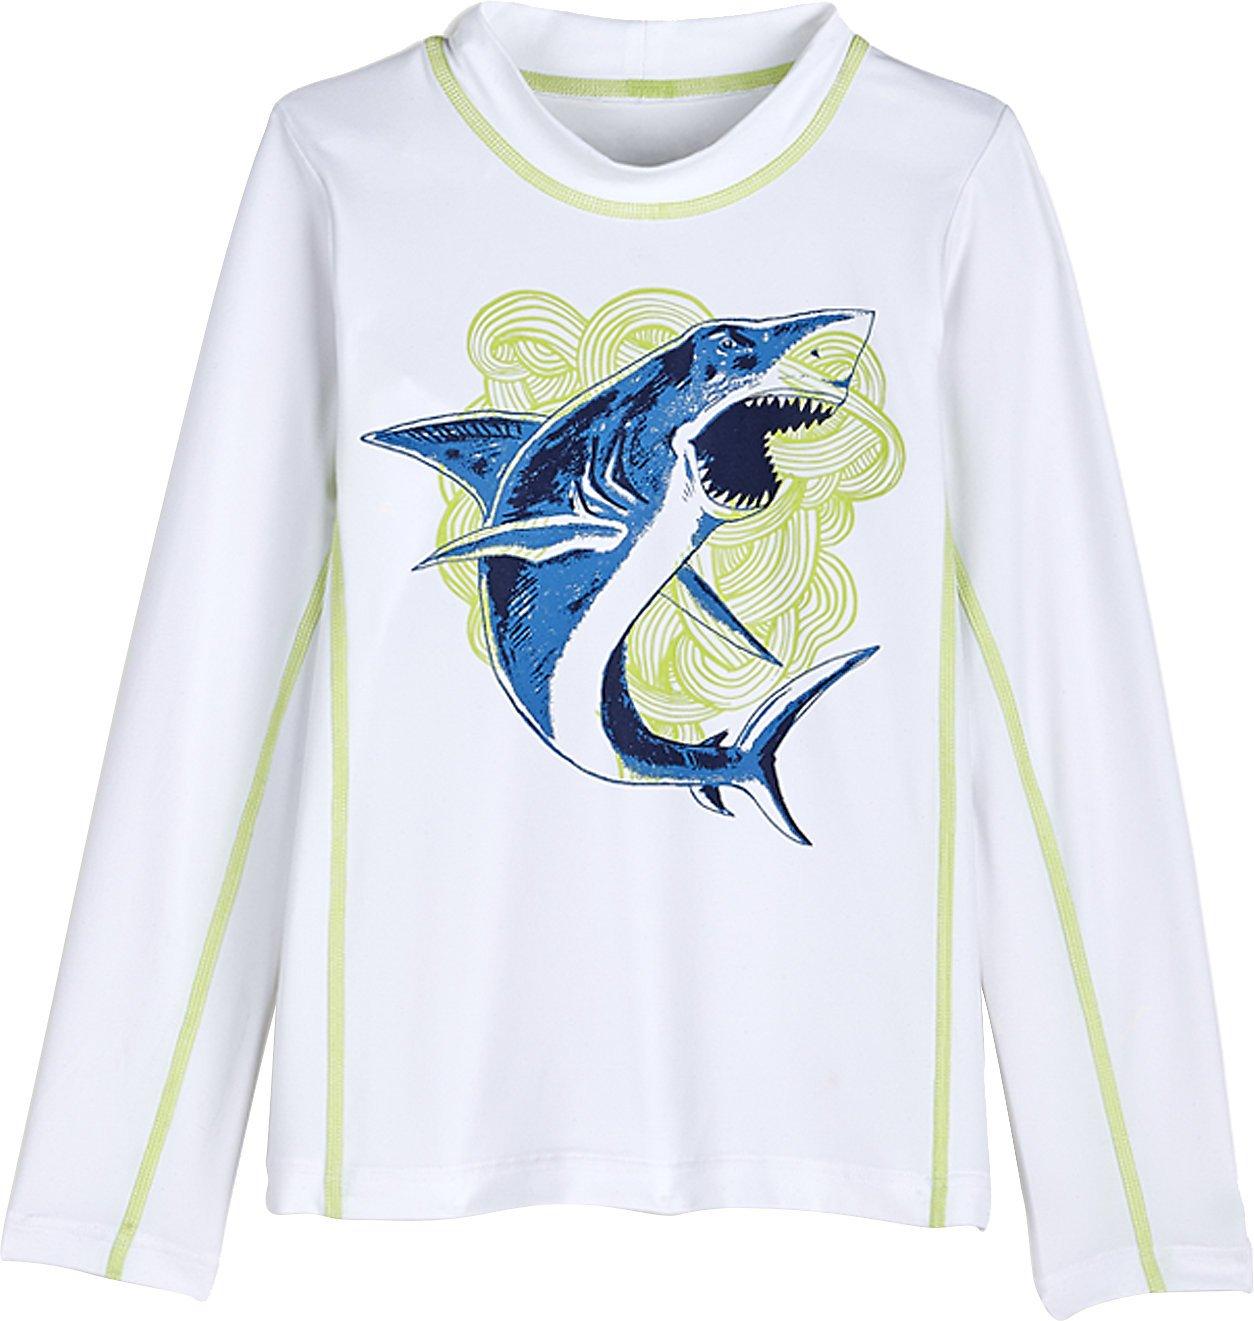 Coolibar UPF 50+ Kids' Long Sleeve Surf Shirt - Sun Protective